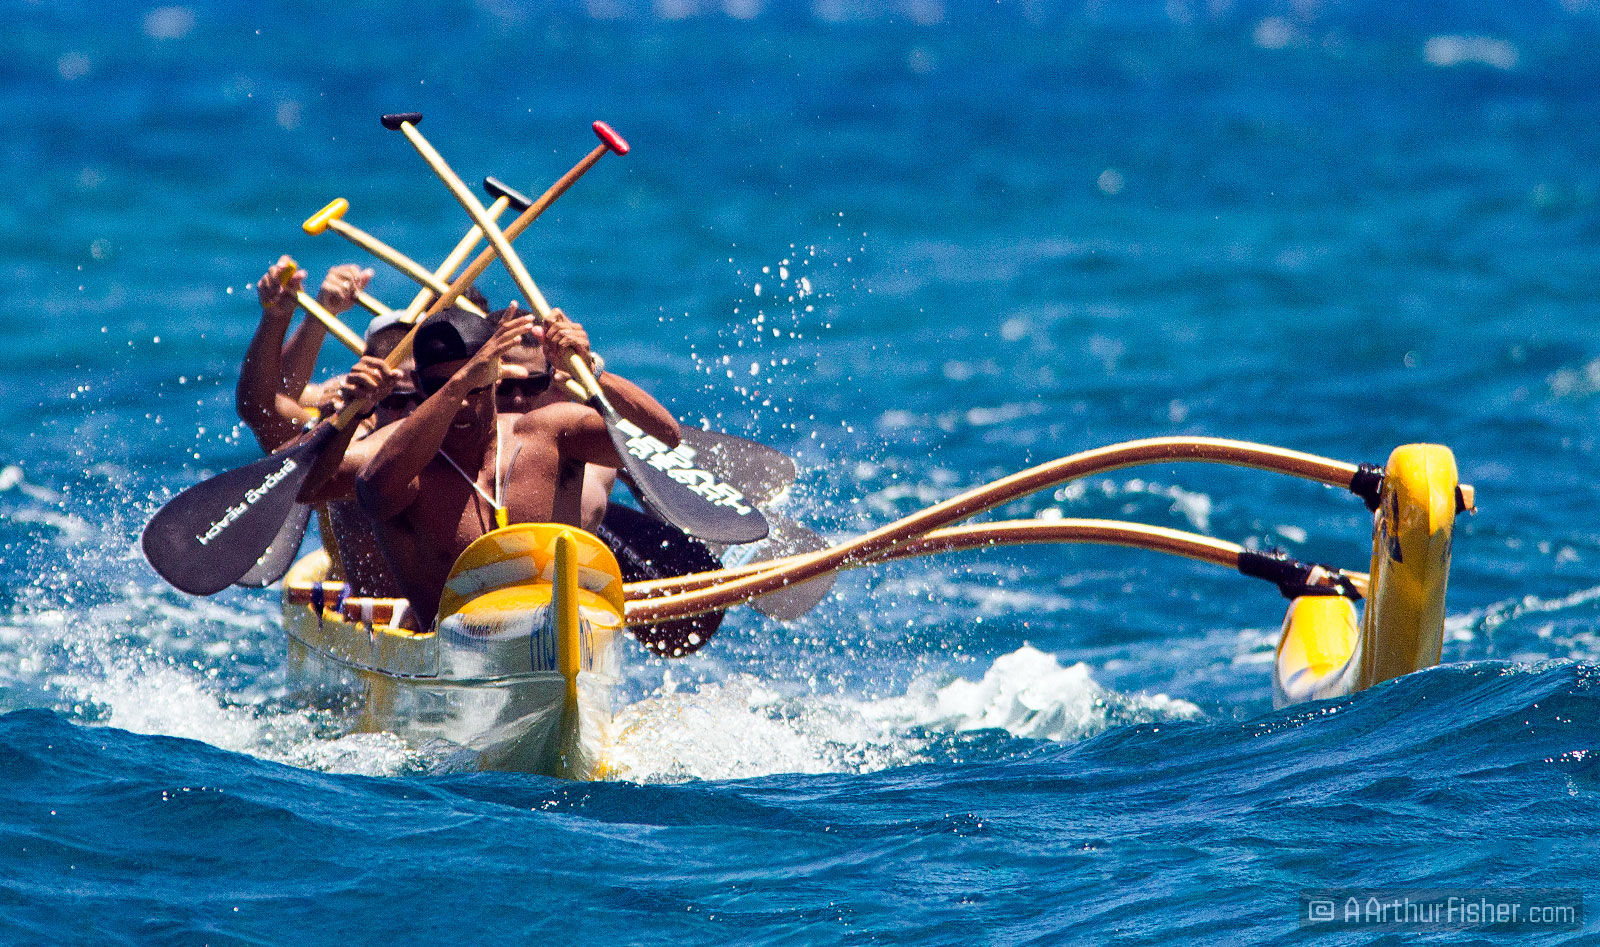 Great Waikoloa Outrigger Canoe Race Champs